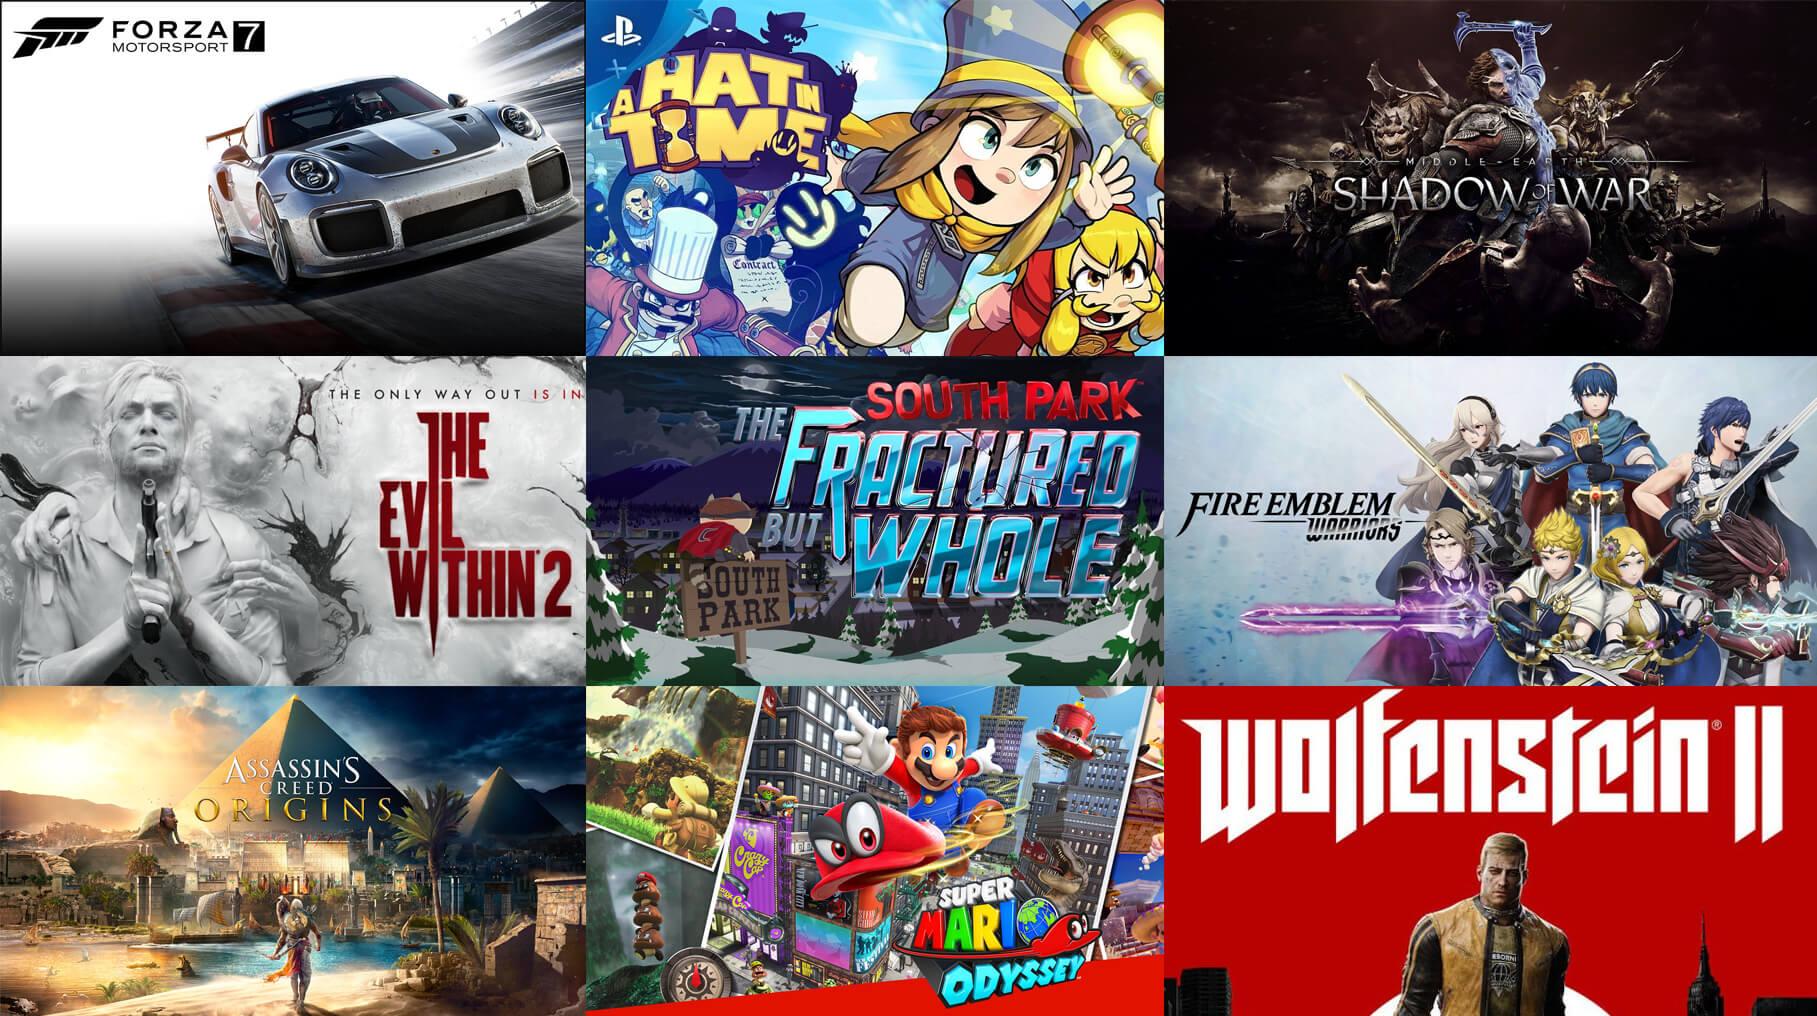 Upcoming Games October 2017